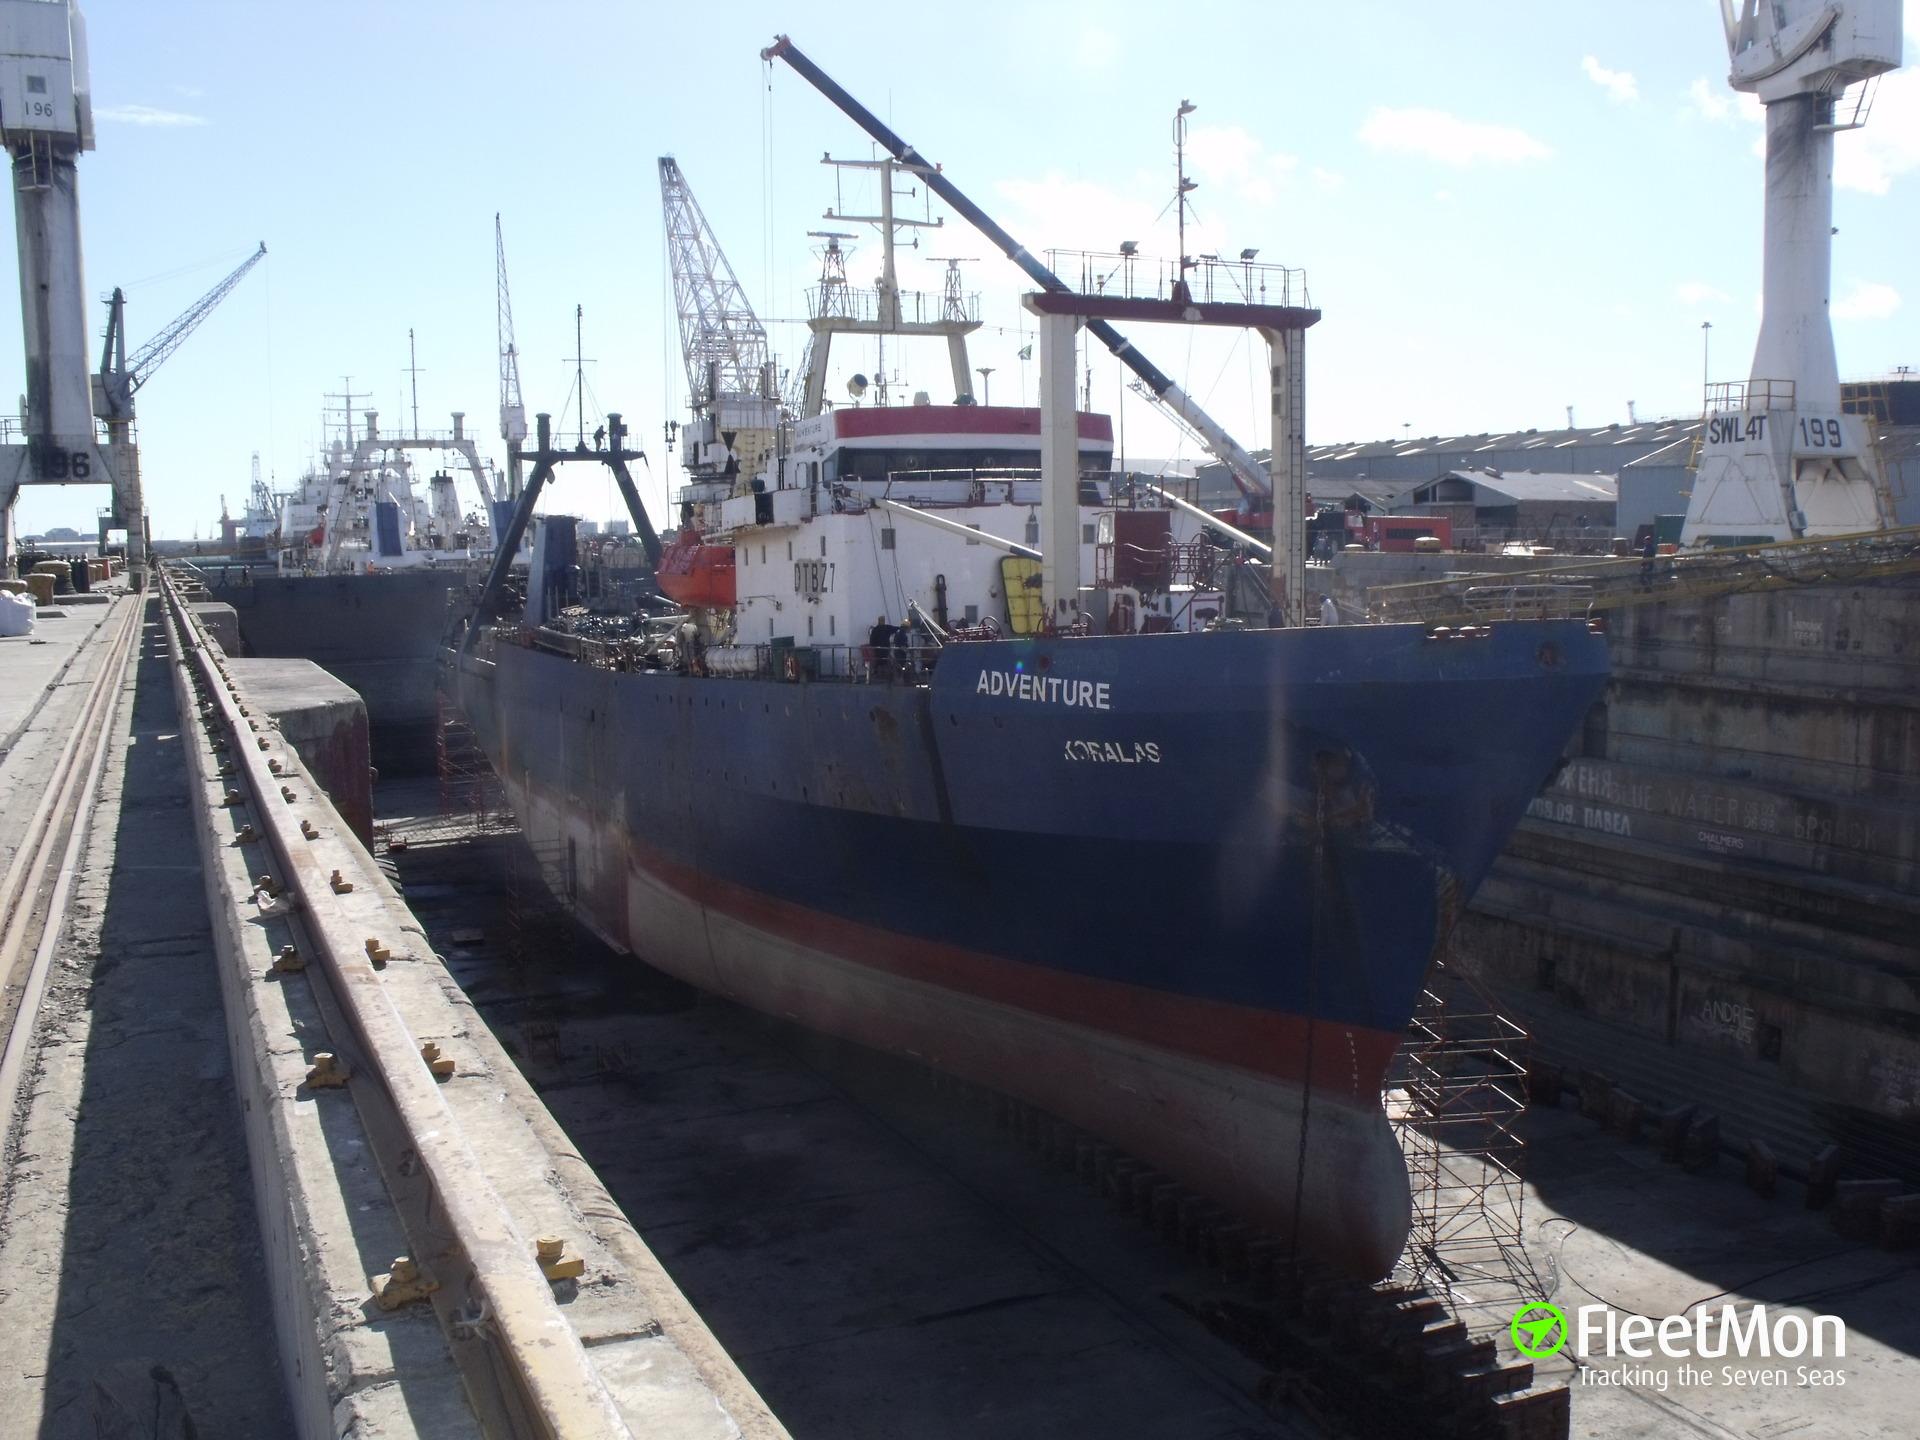 Dry dock flooded, vessels inside damaged, Cape Town